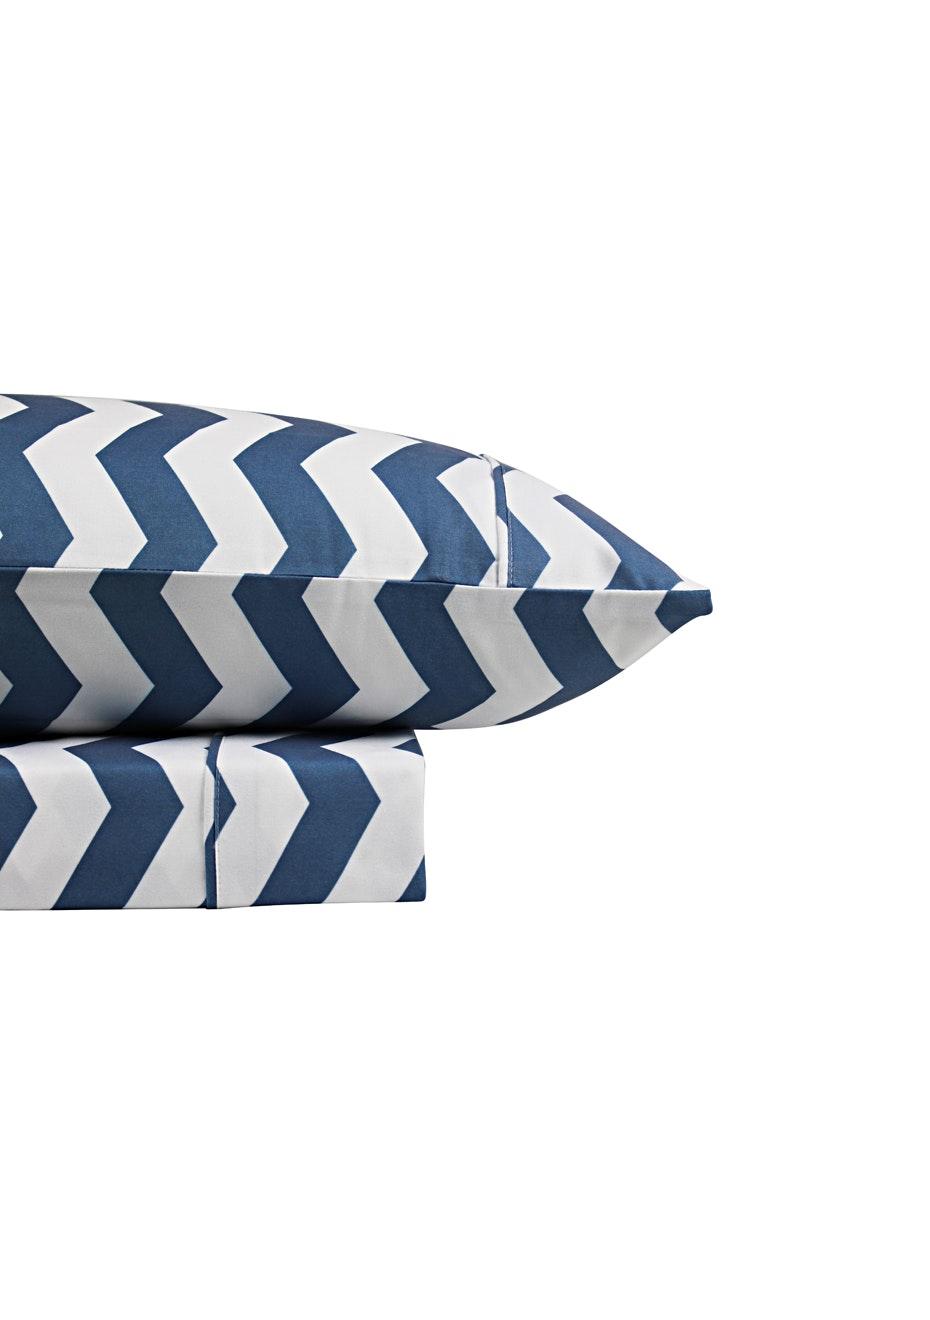 Thermal Flannel Sheet Sets - Chevron Design - Bay Blue - King Single Bed